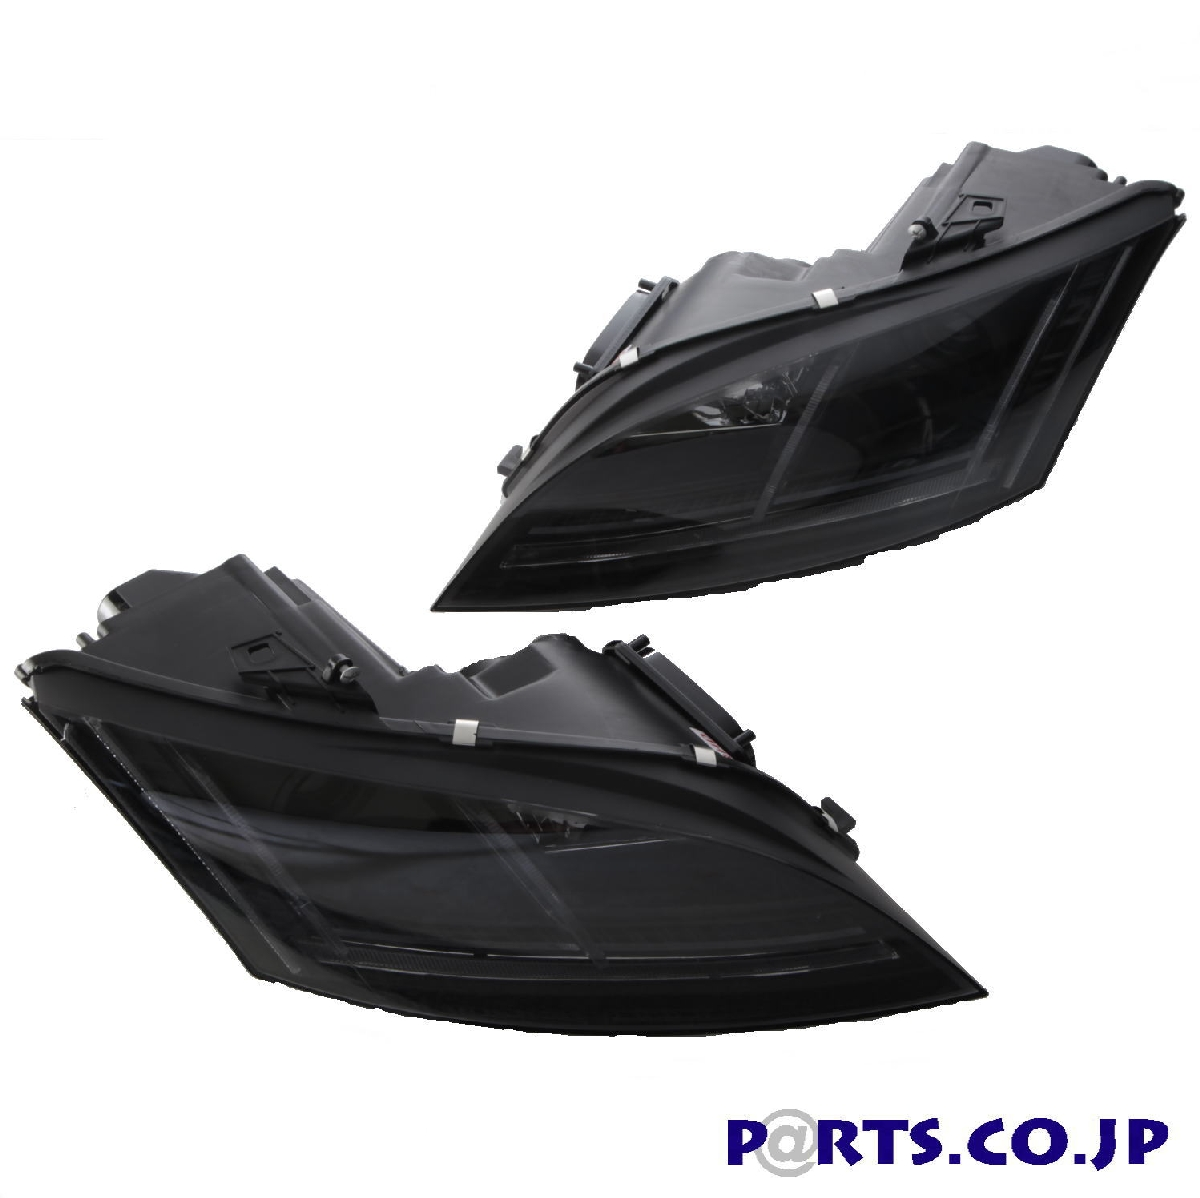 SONAR(ソナー) DRLプロジェクターヘッドライトブラックシーケンシャルアウディTT 06-13